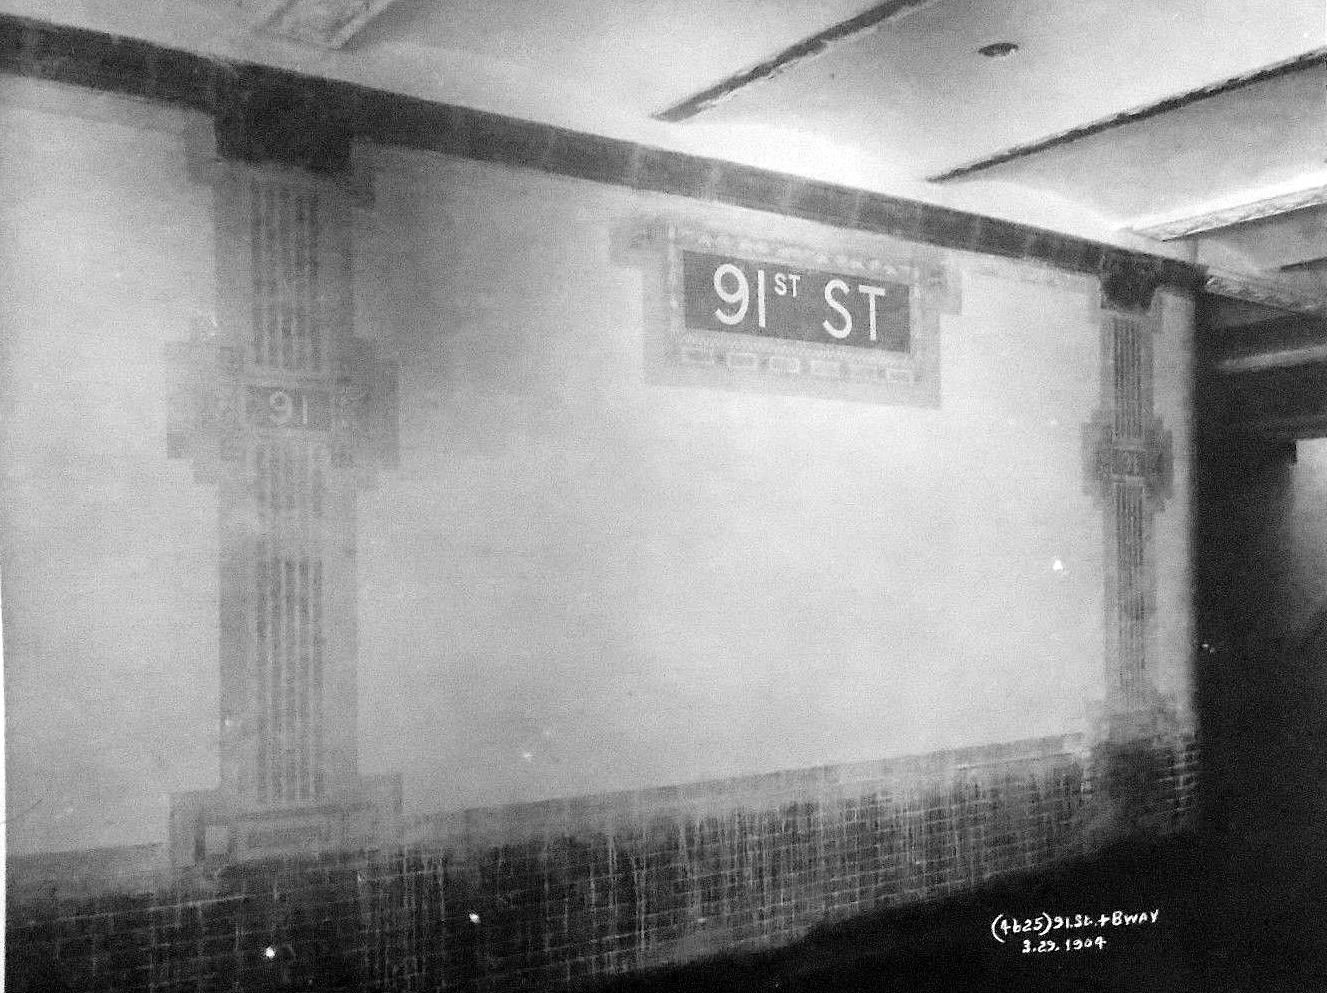 (924k, 1327x993)<br><b>Country:</b> United States<br><b>City:</b> New York<br><b>System:</b> New York City Transit<br><b>Line:</b> IRT West Side Line<br><b>Location:</b> 91st Street<br><b>Date:</b> 3/29/1904<br><b>Viewed (this week/total):</b> 9 / 163